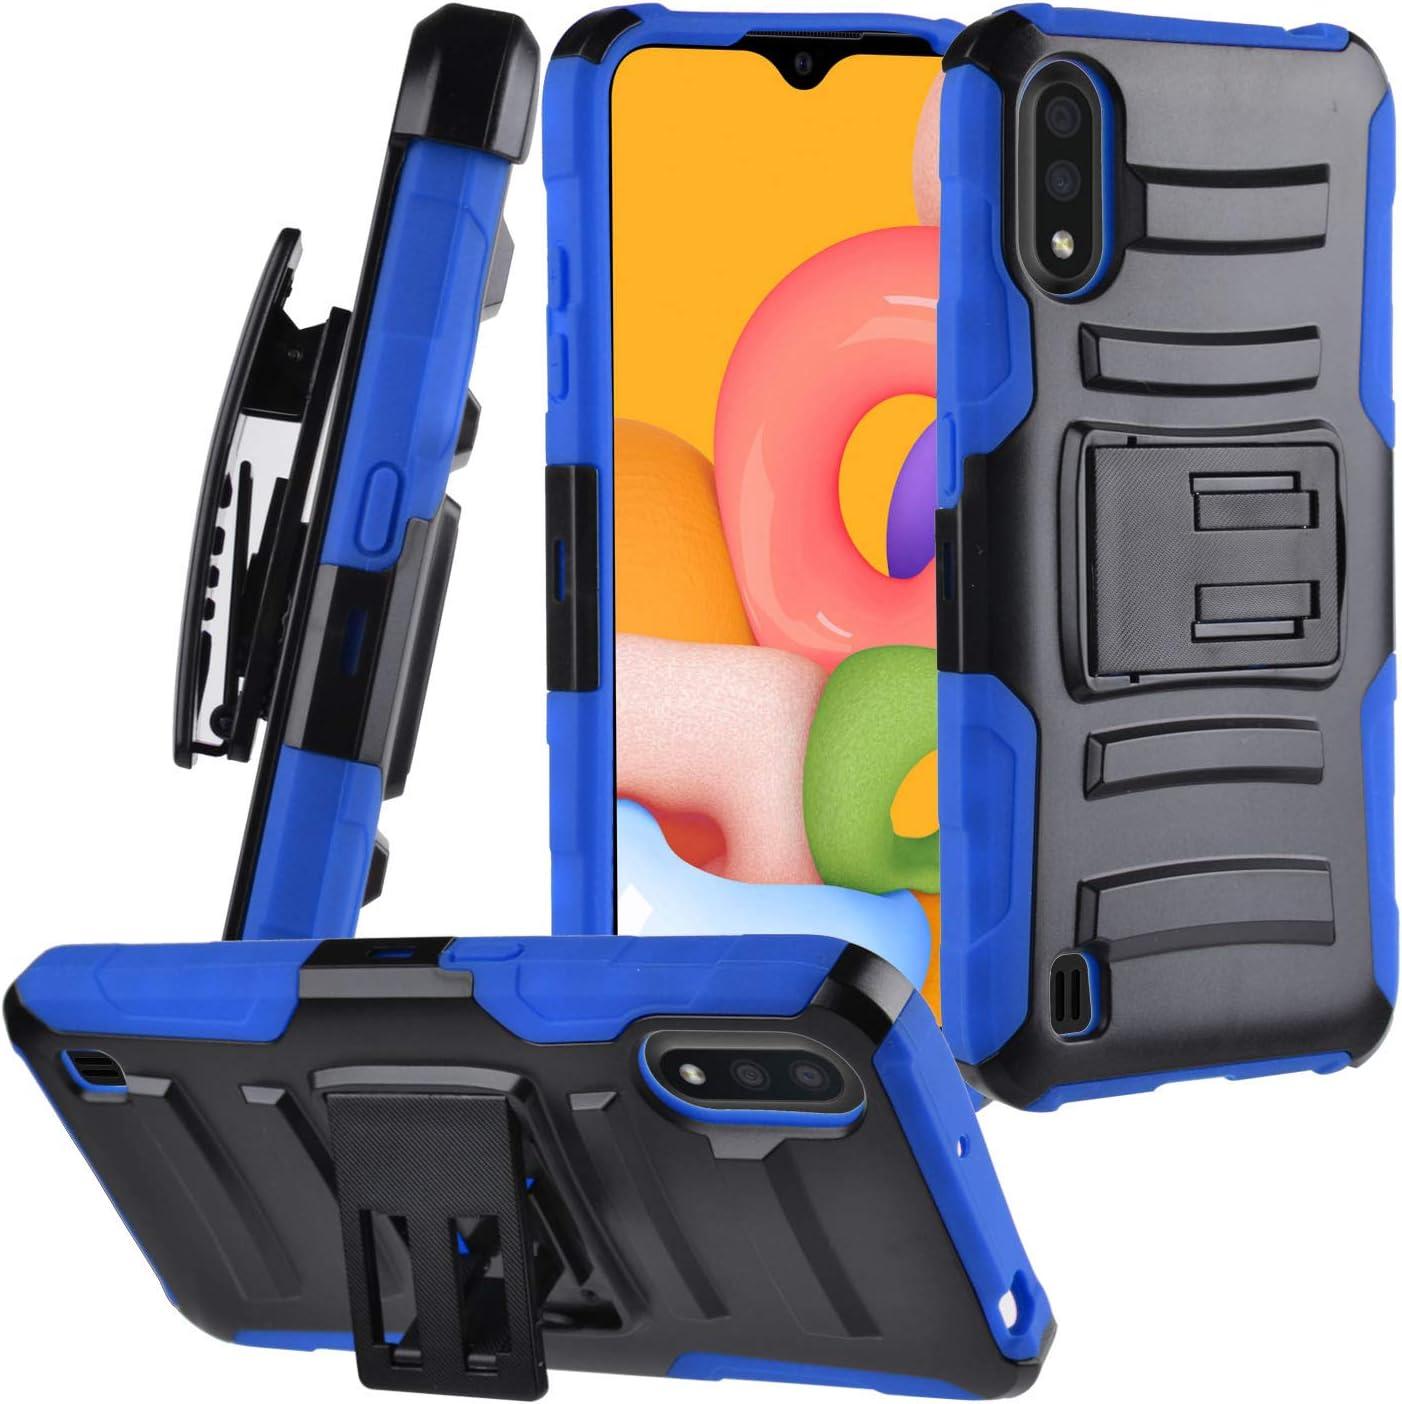 CELZEN - for Samsung Galaxy A01 SM-A015 - Hybrid Phone Case w/Stand/Belt Clip Holster - CV1 Blue